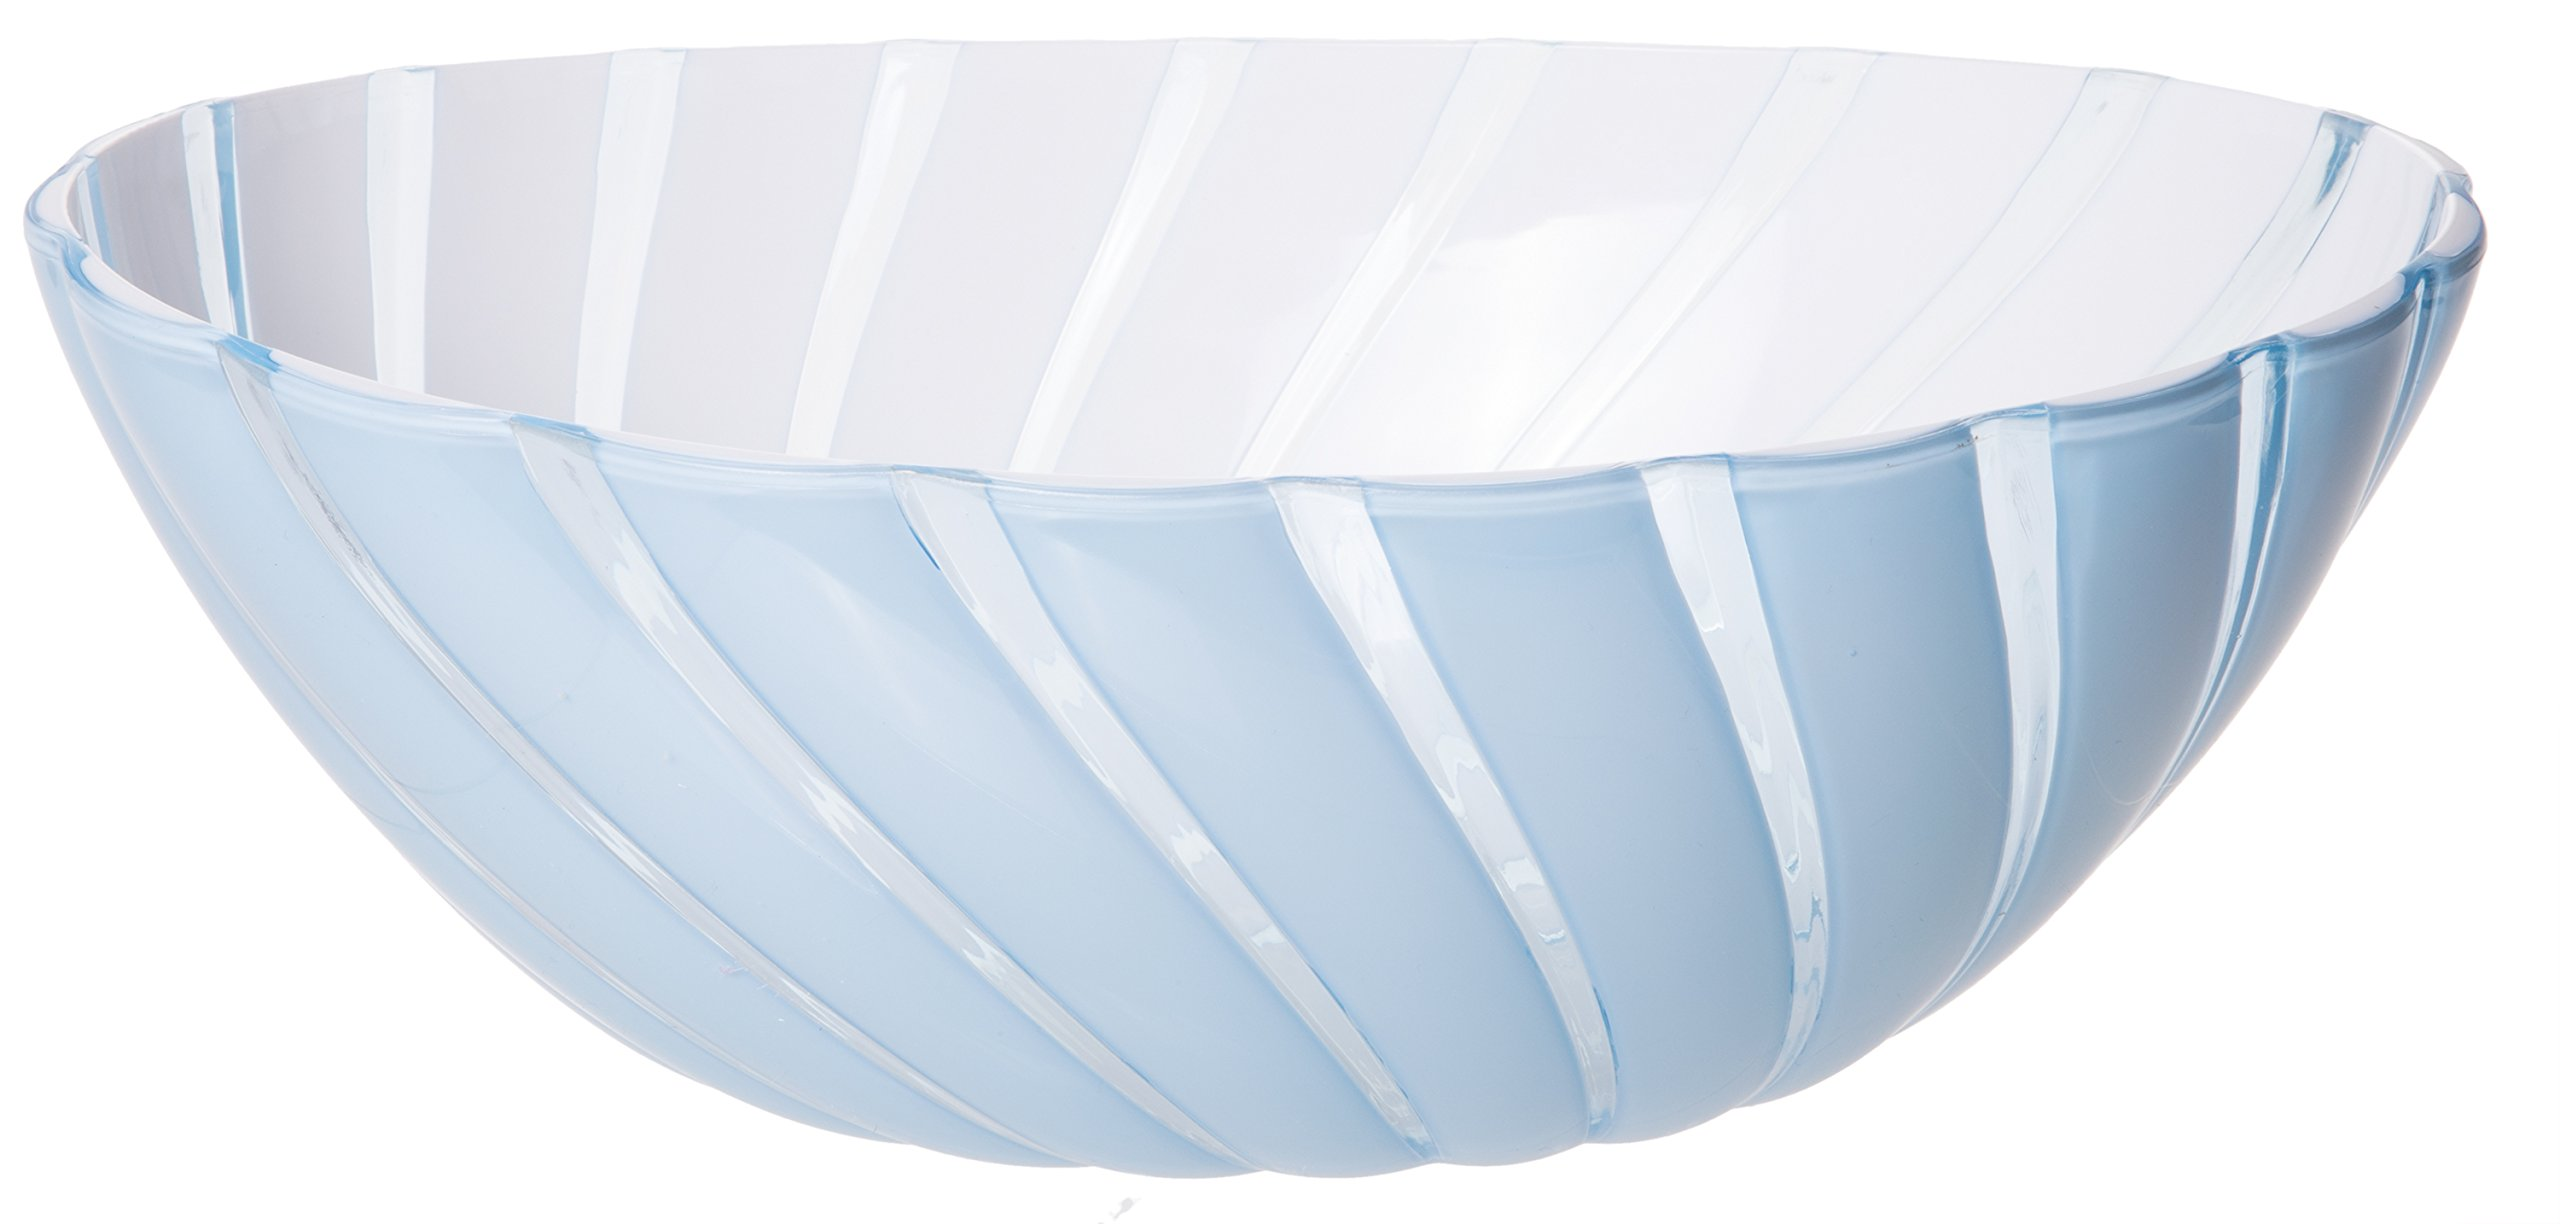 Safir Durable Plastic Salad Mixing Bowl, All Purpose Food Prep and Serving Bowl, 4.3 Lt (Random Color)